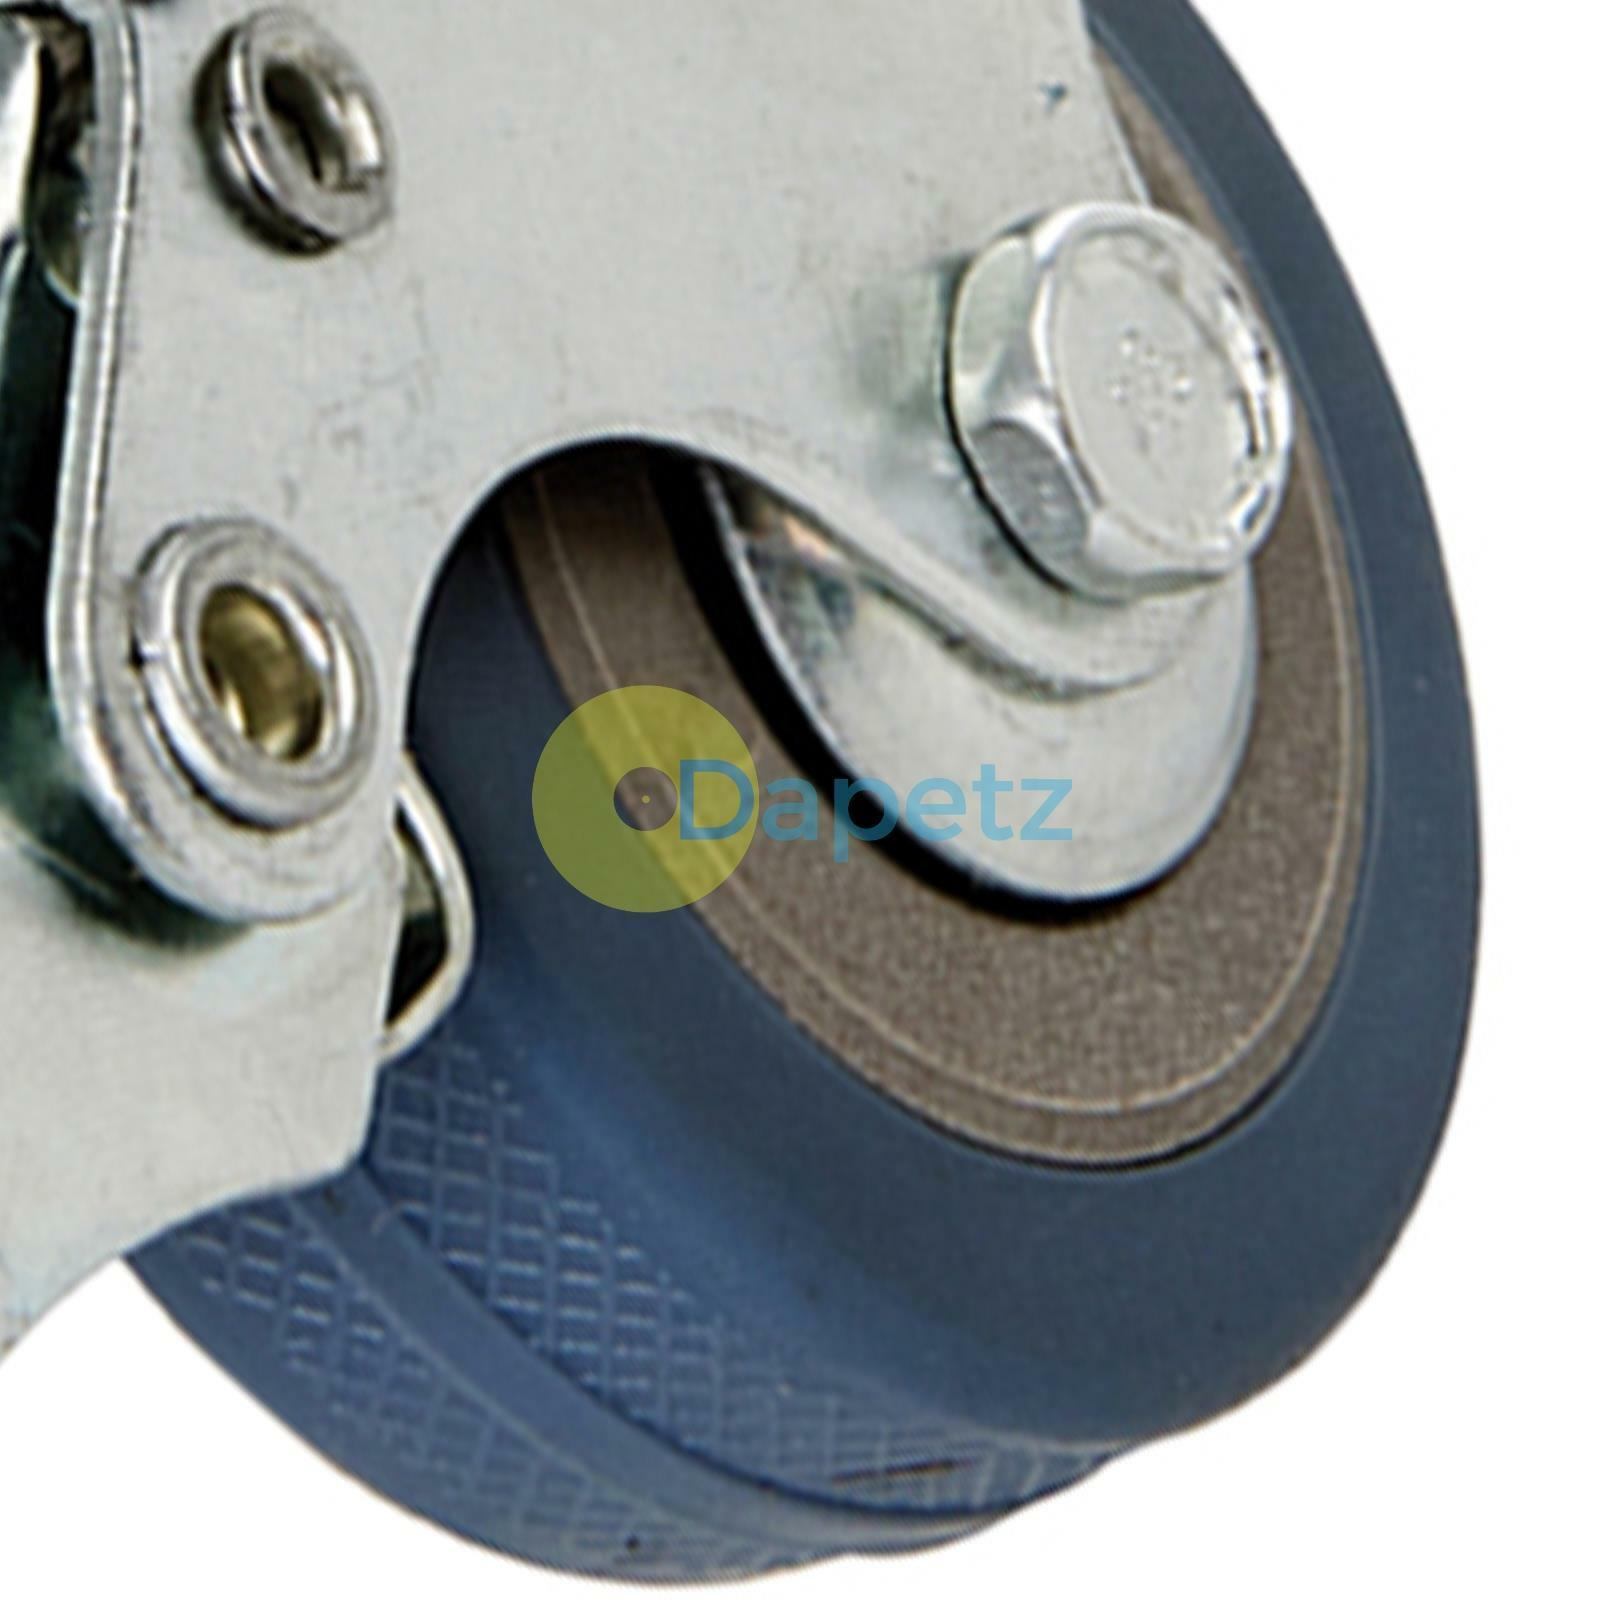 s l1600 - Resistente Giratorio Ruedecilla de Goma Rueda Ruedas Cart Rueda 50mm 10 PC